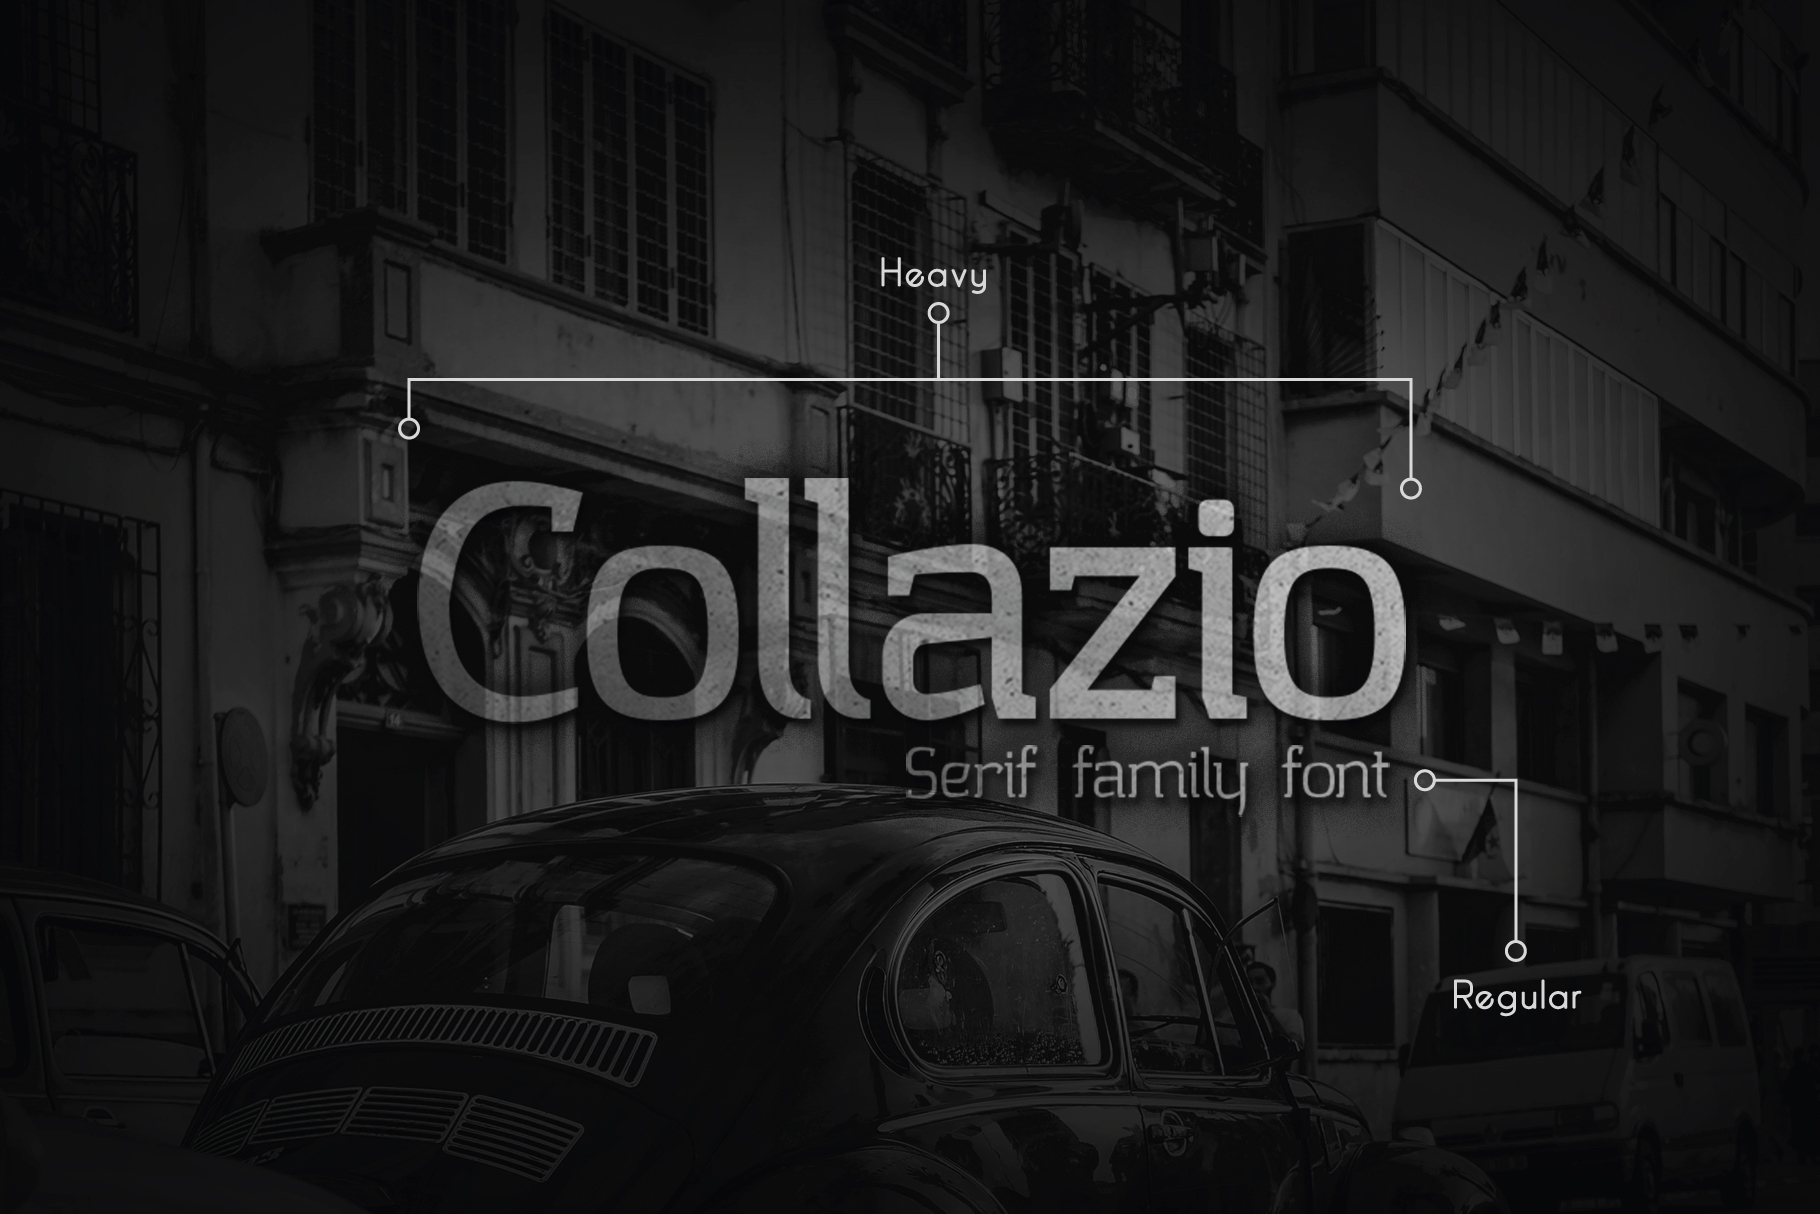 Collazio Serif Family Typeface example image 1